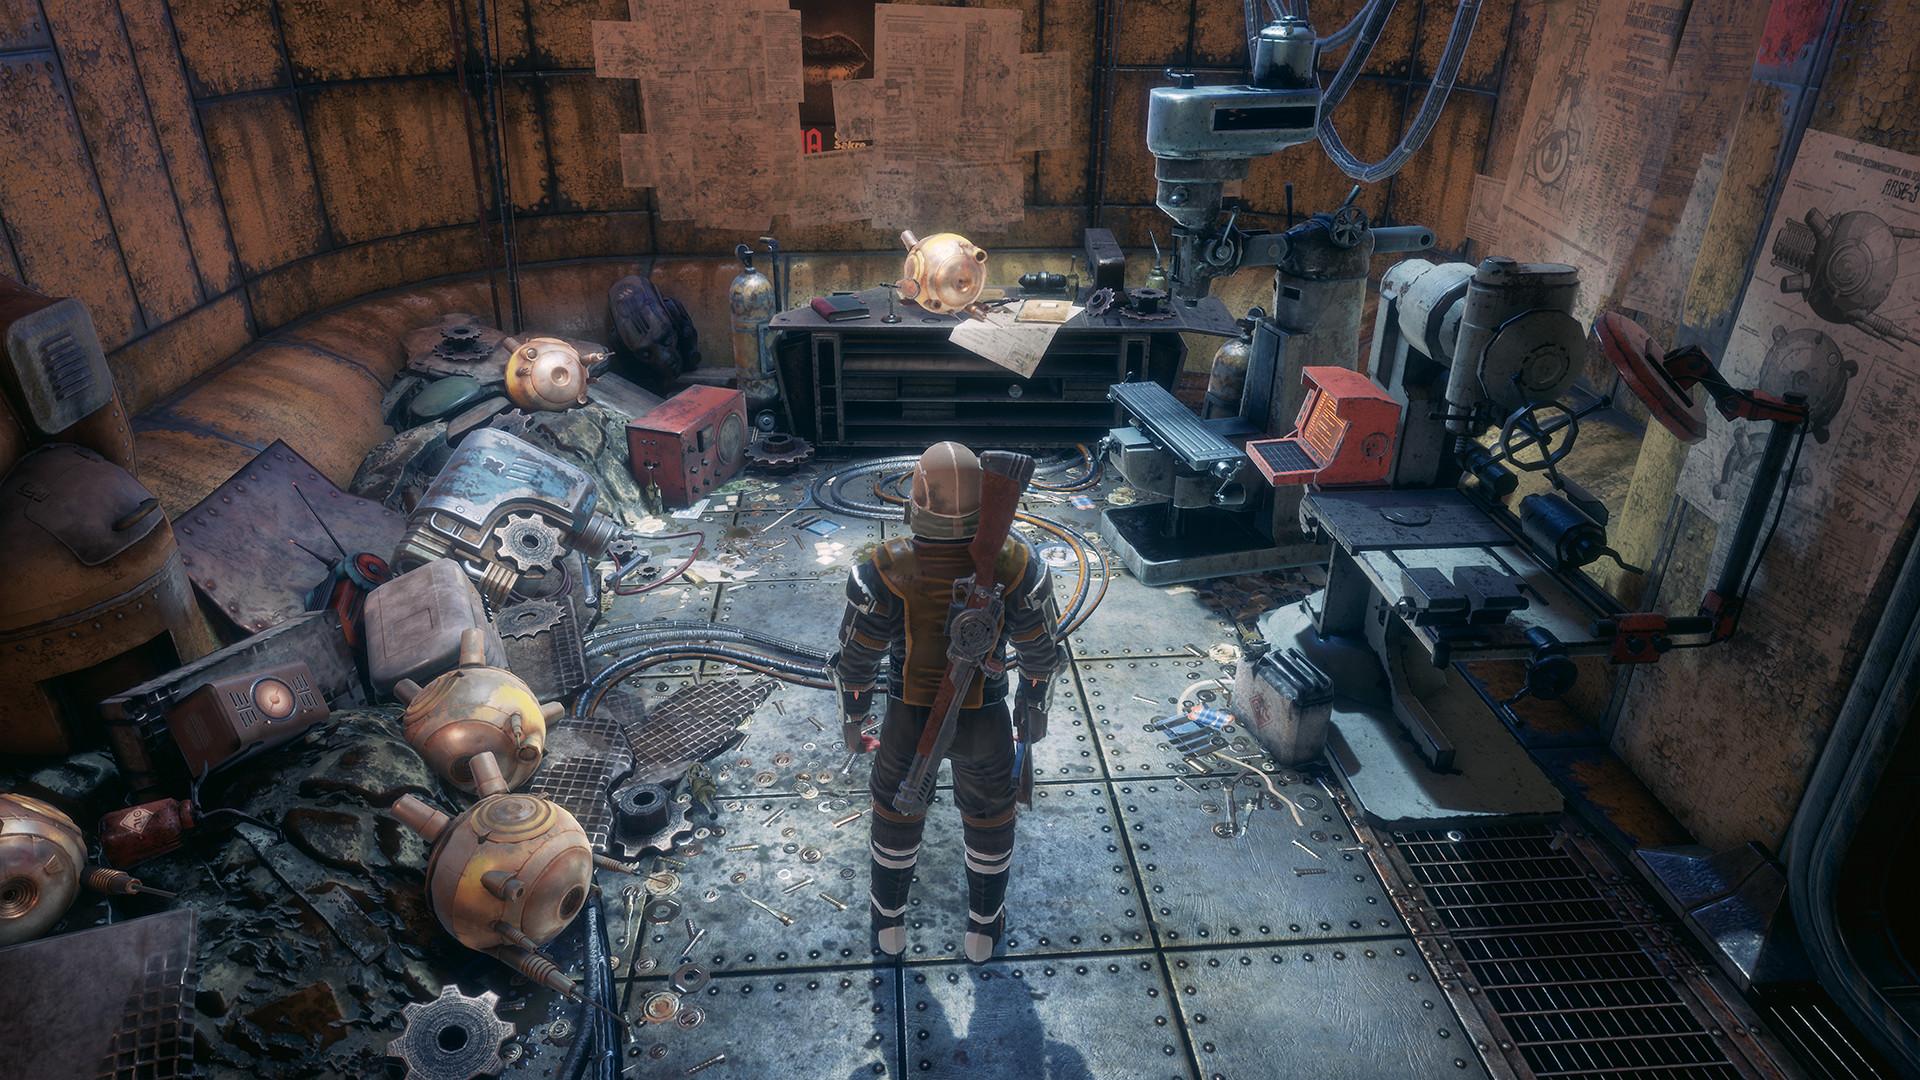 Insomnia: The Ark Screenshot 8 - Bilderquelle: HeroCraft